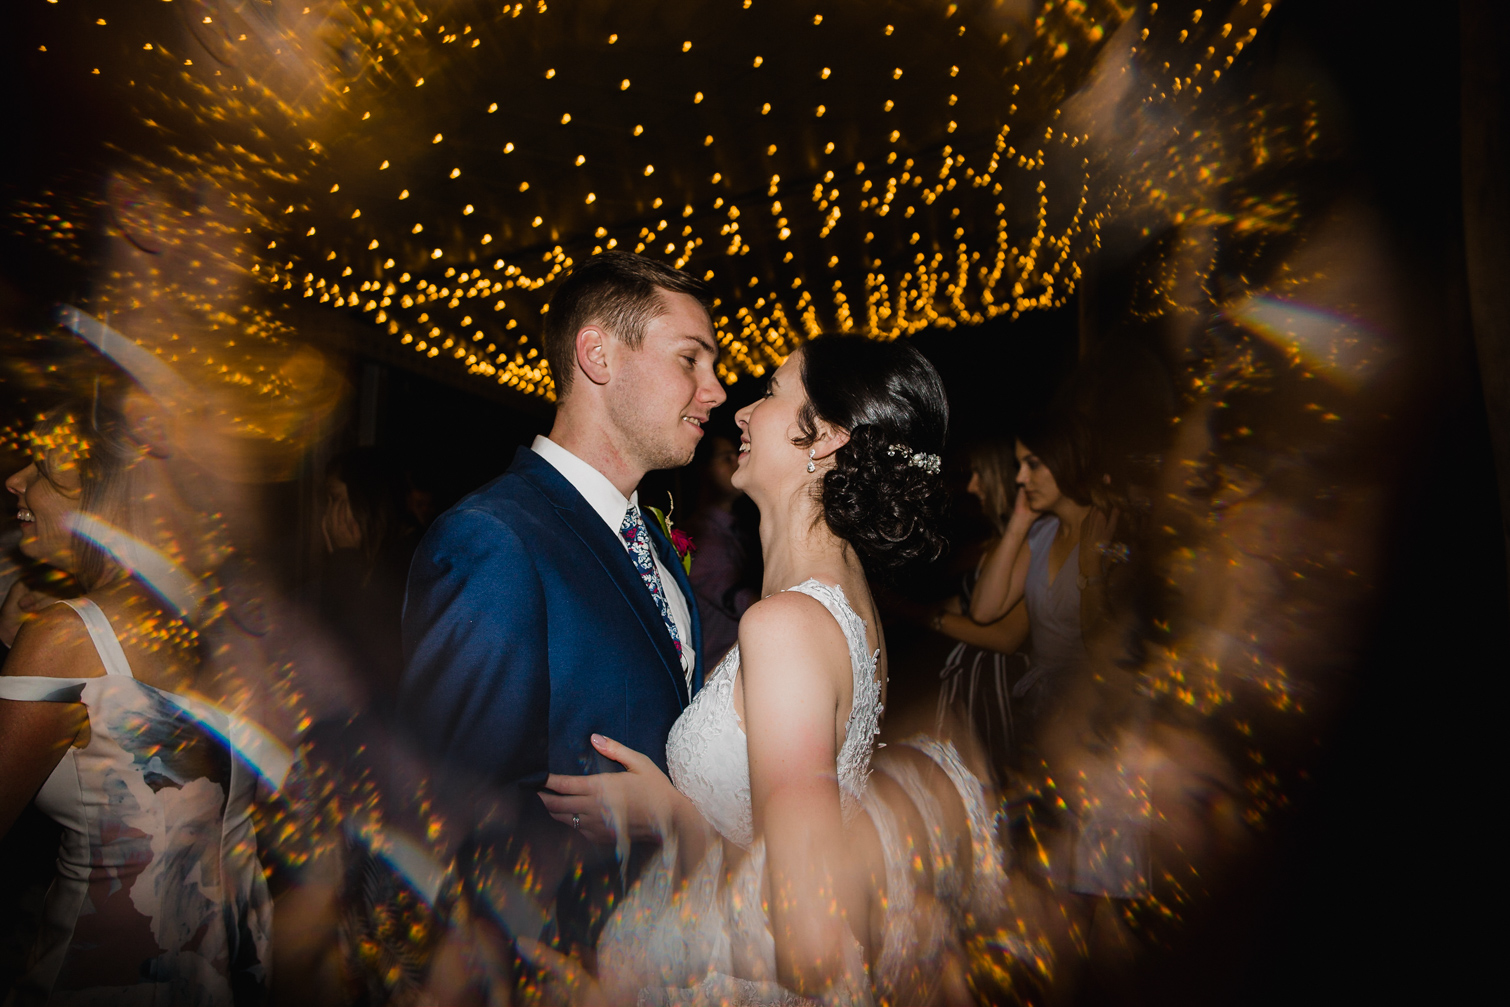 Boomerang_Farm_Gold_Coast_Wedding_Photography-291.jpg